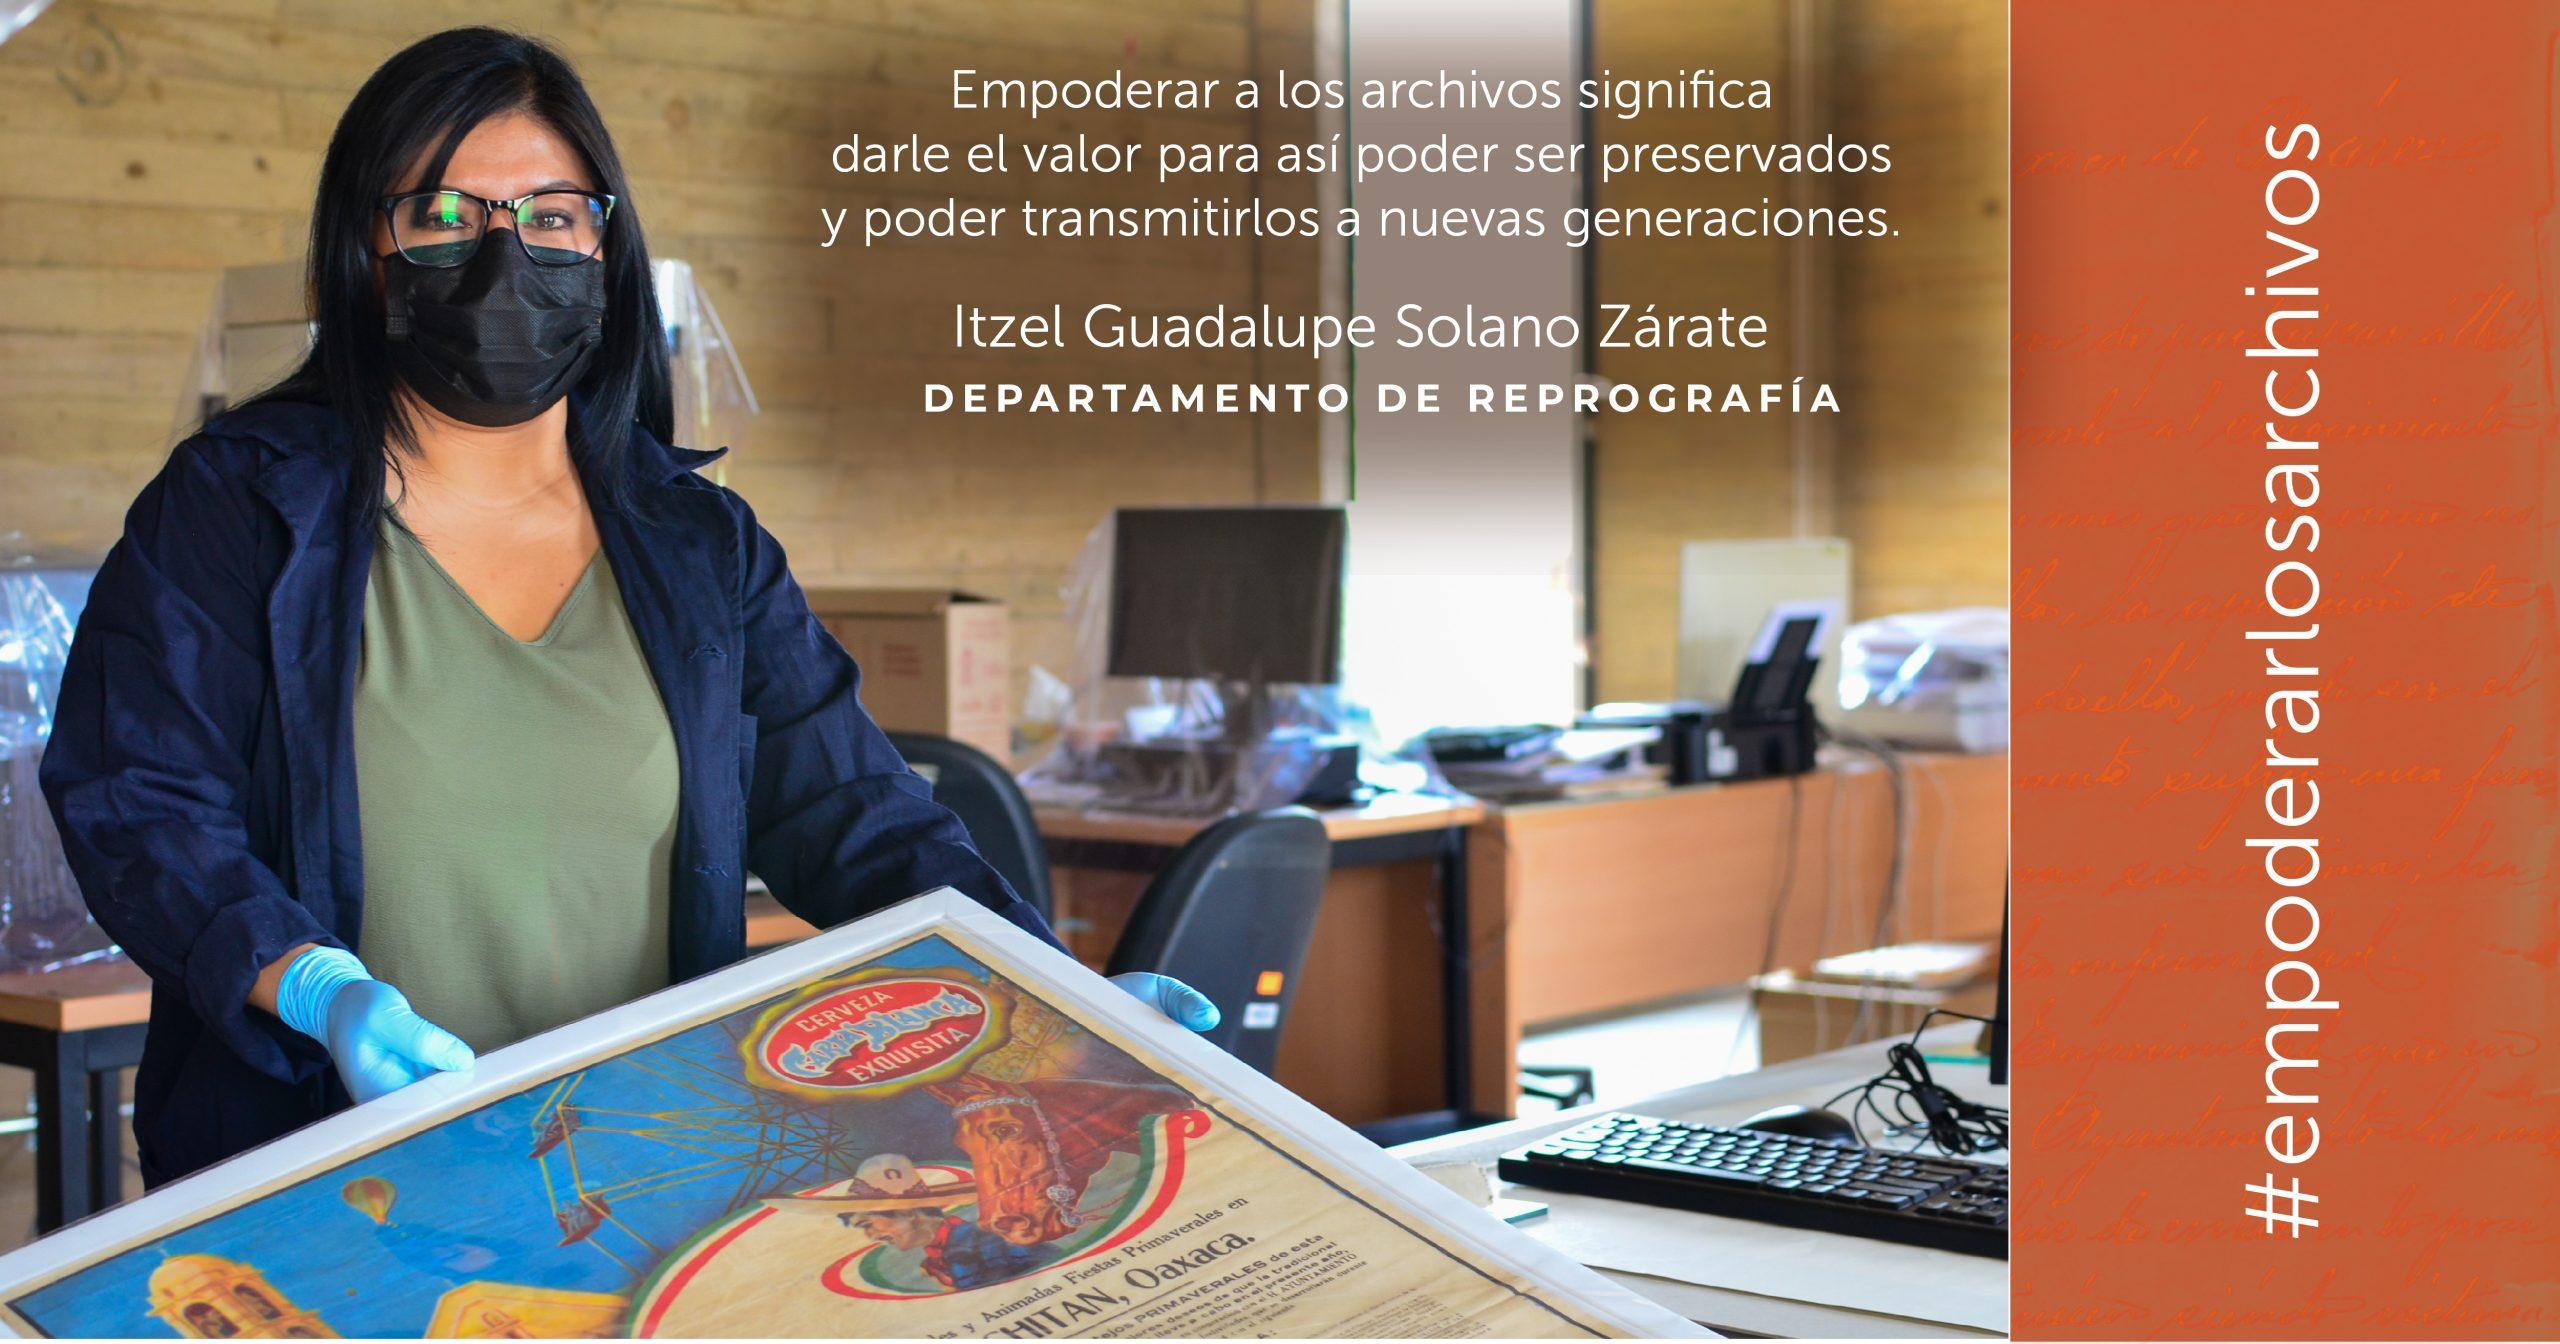 DIADELOSARCHIVOS21-24